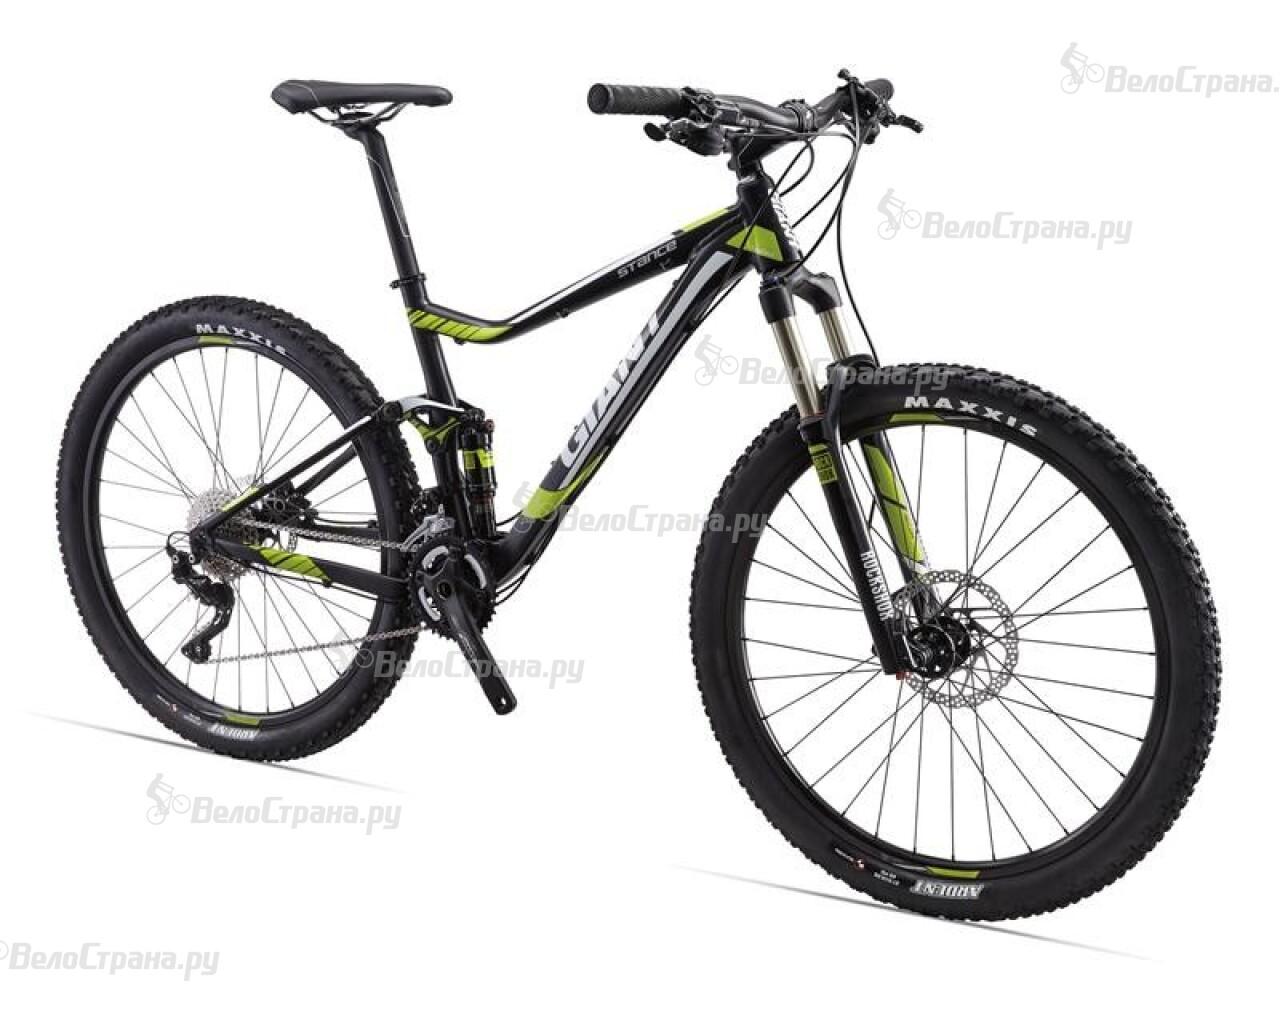 все цены на  Велосипед Giant Stance 27.5 1 (2015)  онлайн